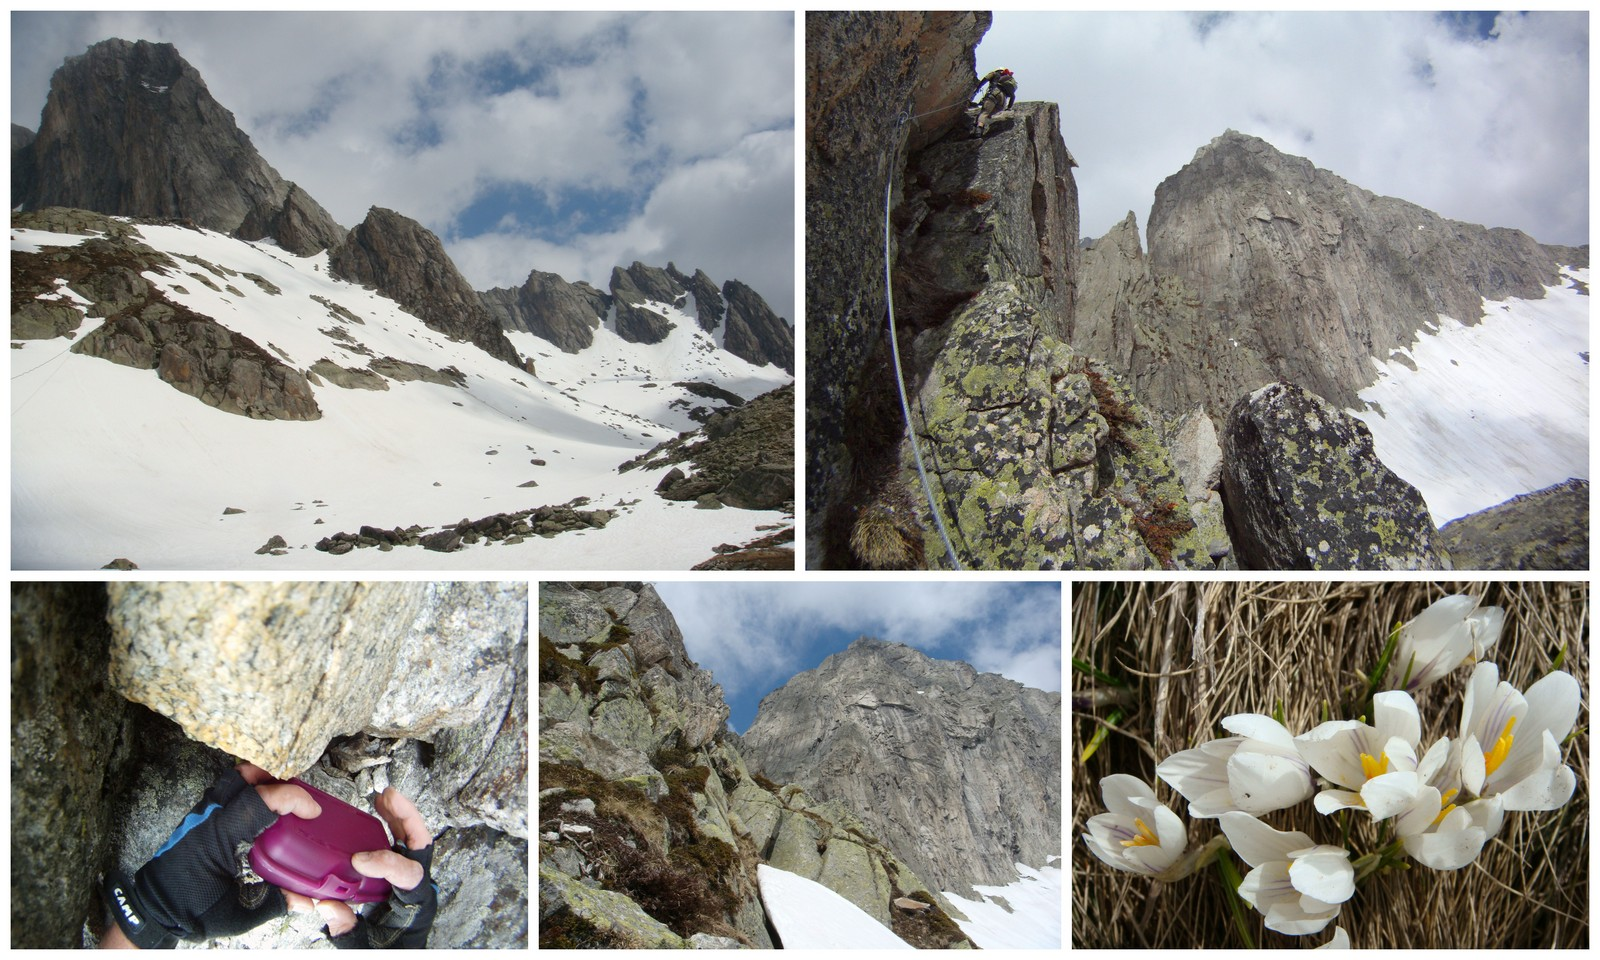 Klettersteig Uri : Gc3meez klettersteig bergsee krokodil traditional cache in uri